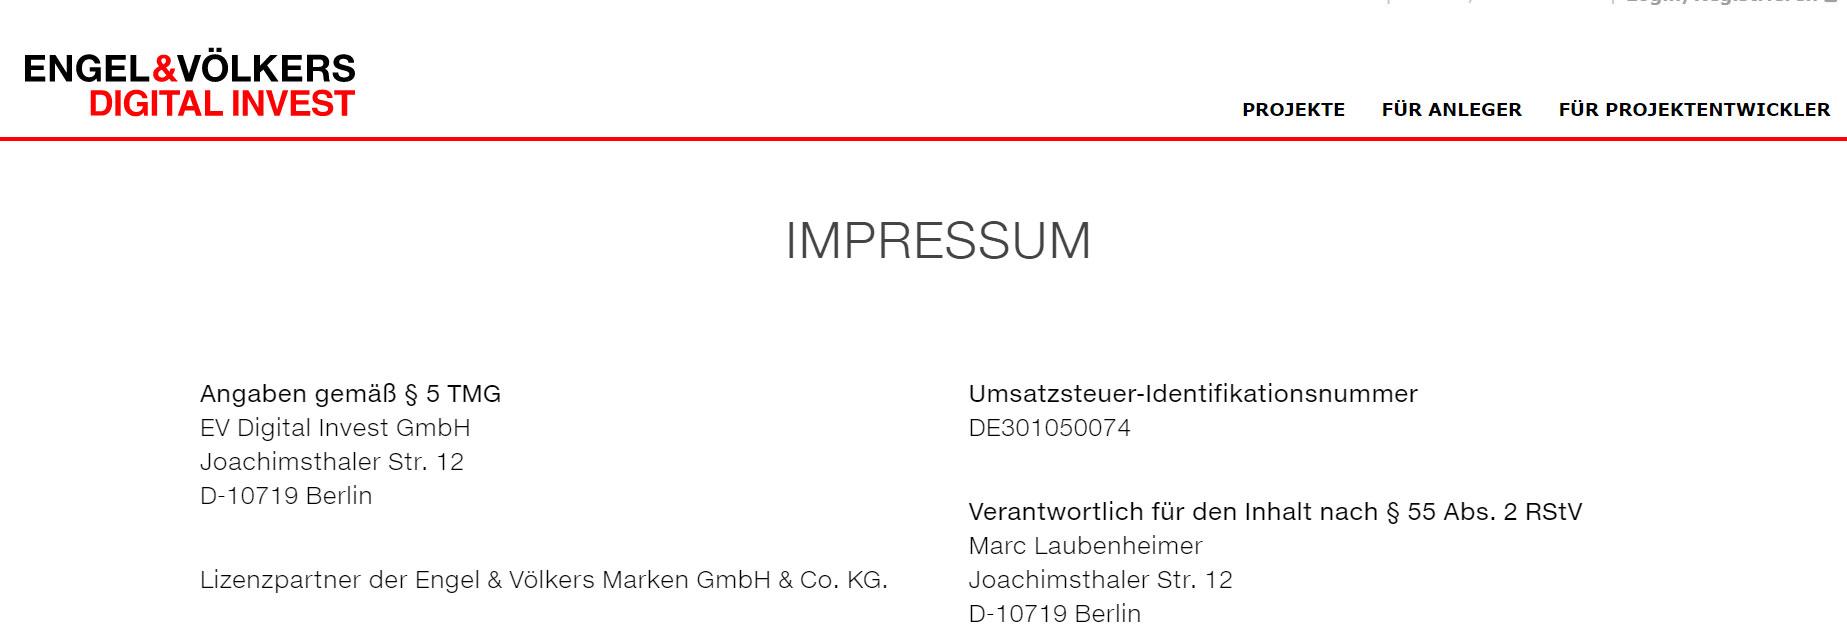 EV Digital Invest GmbH